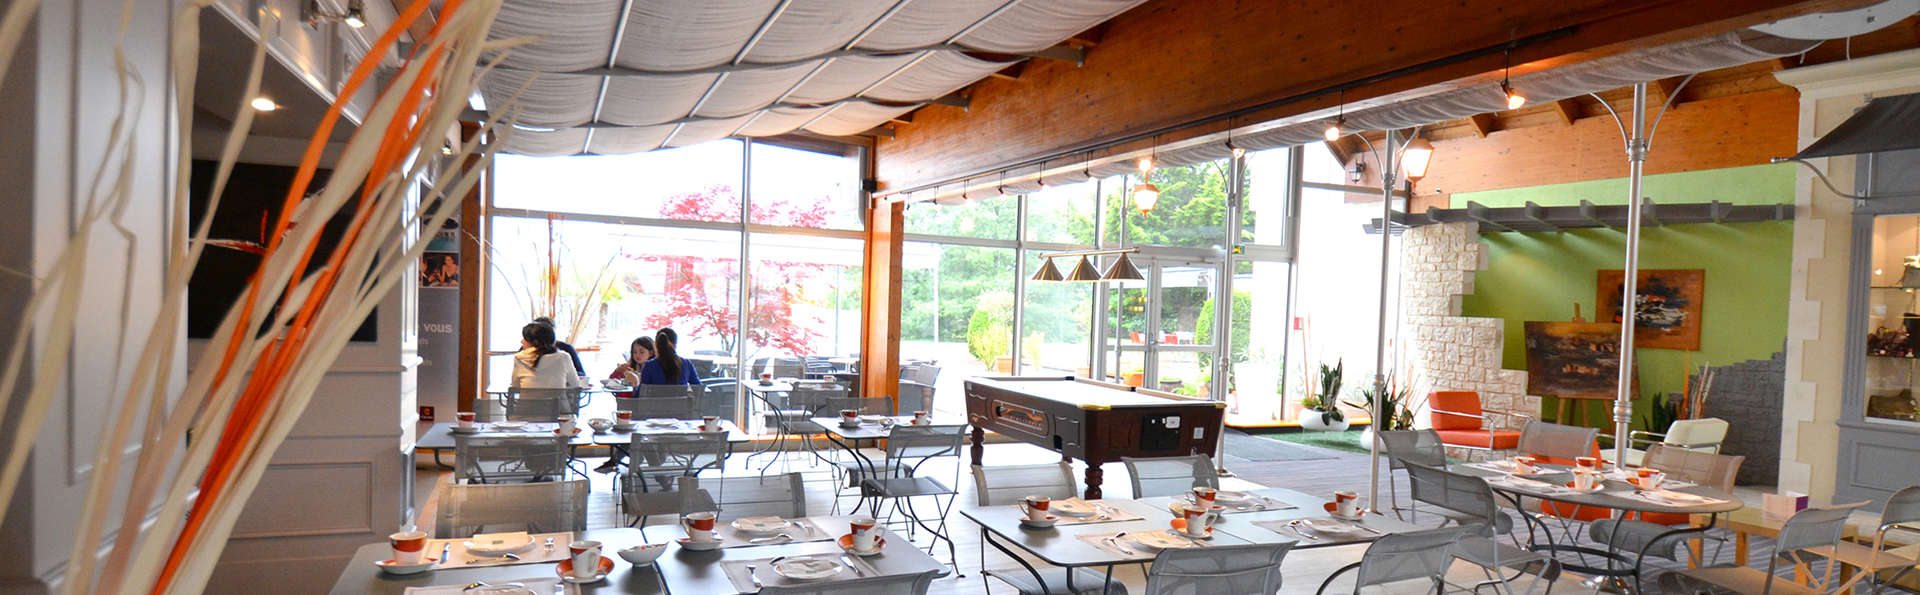 Kyriad Direct Poitiers Nord Futuroscope - EDIT_restaurant1.jpg